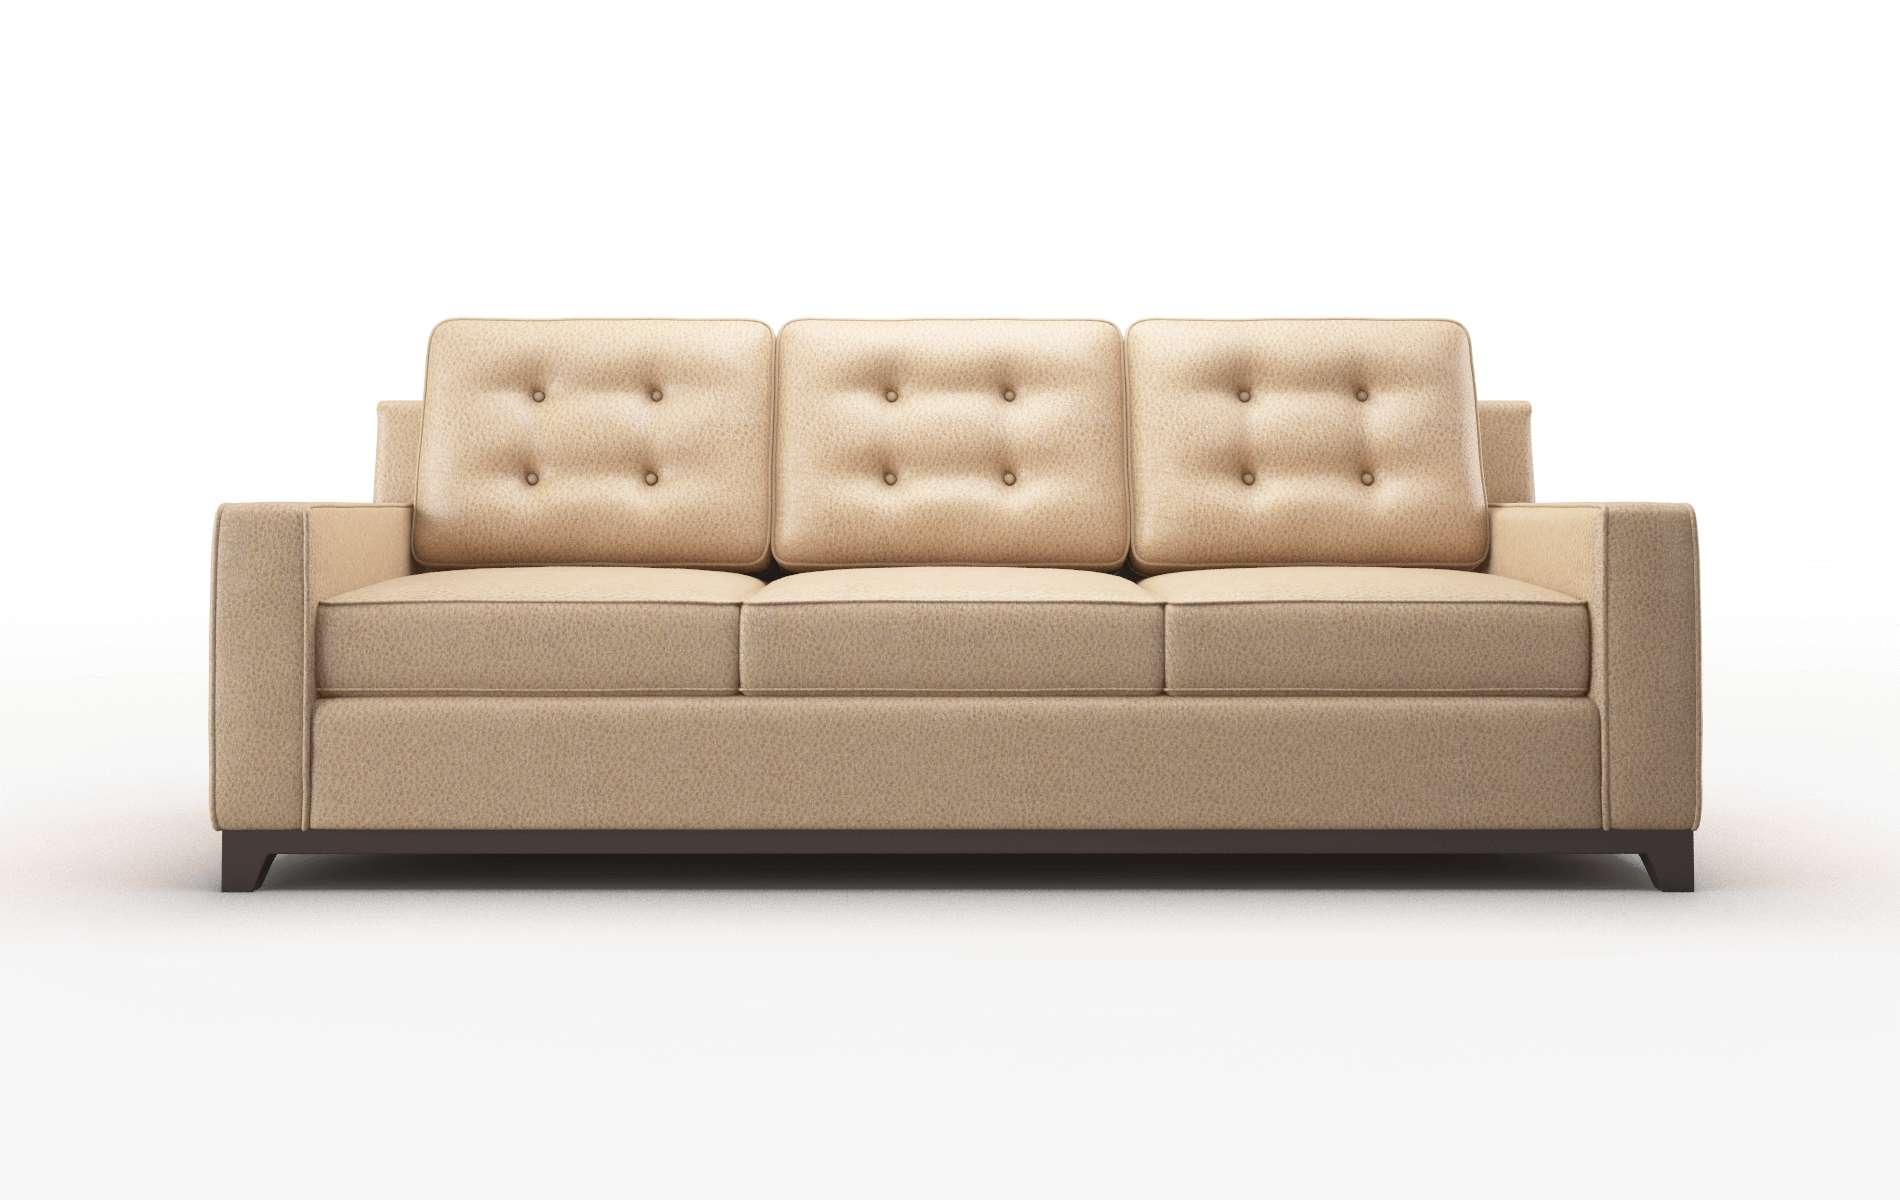 Alexandria Ford Dune Sofa espresso legs 1